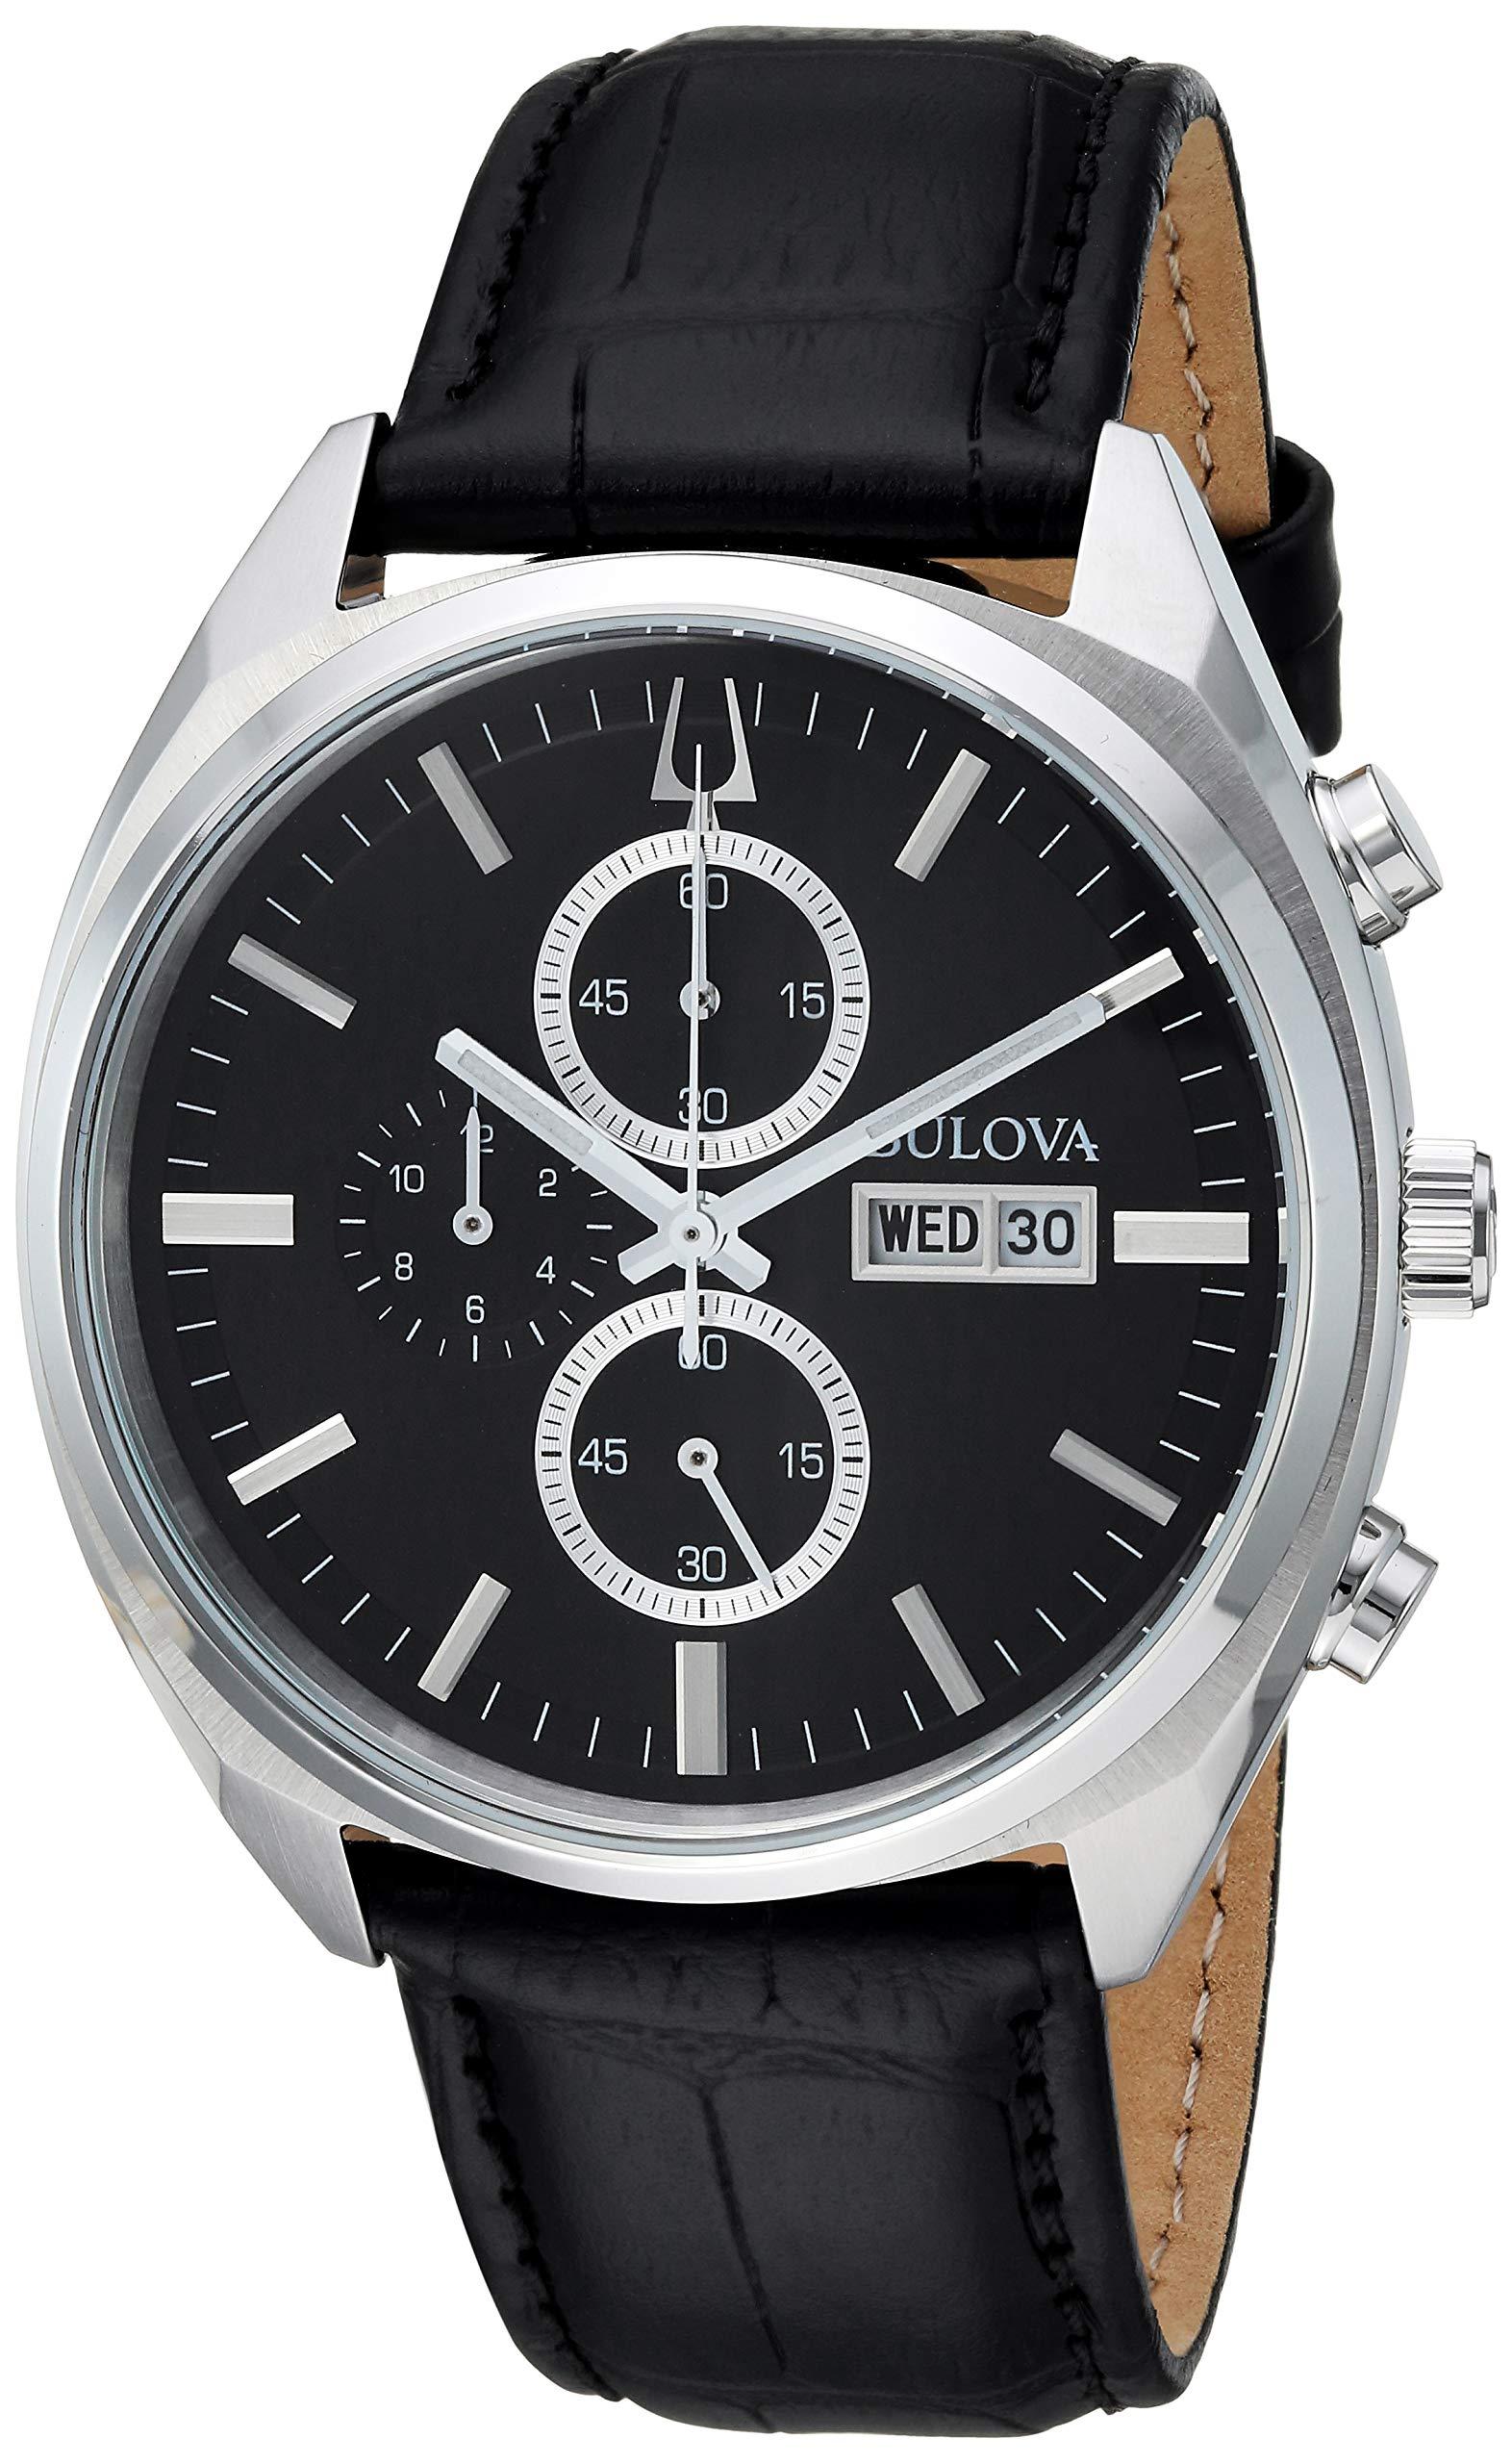 Bulova Mens Chronograph Quartz Watch with Leather Strap 96C133